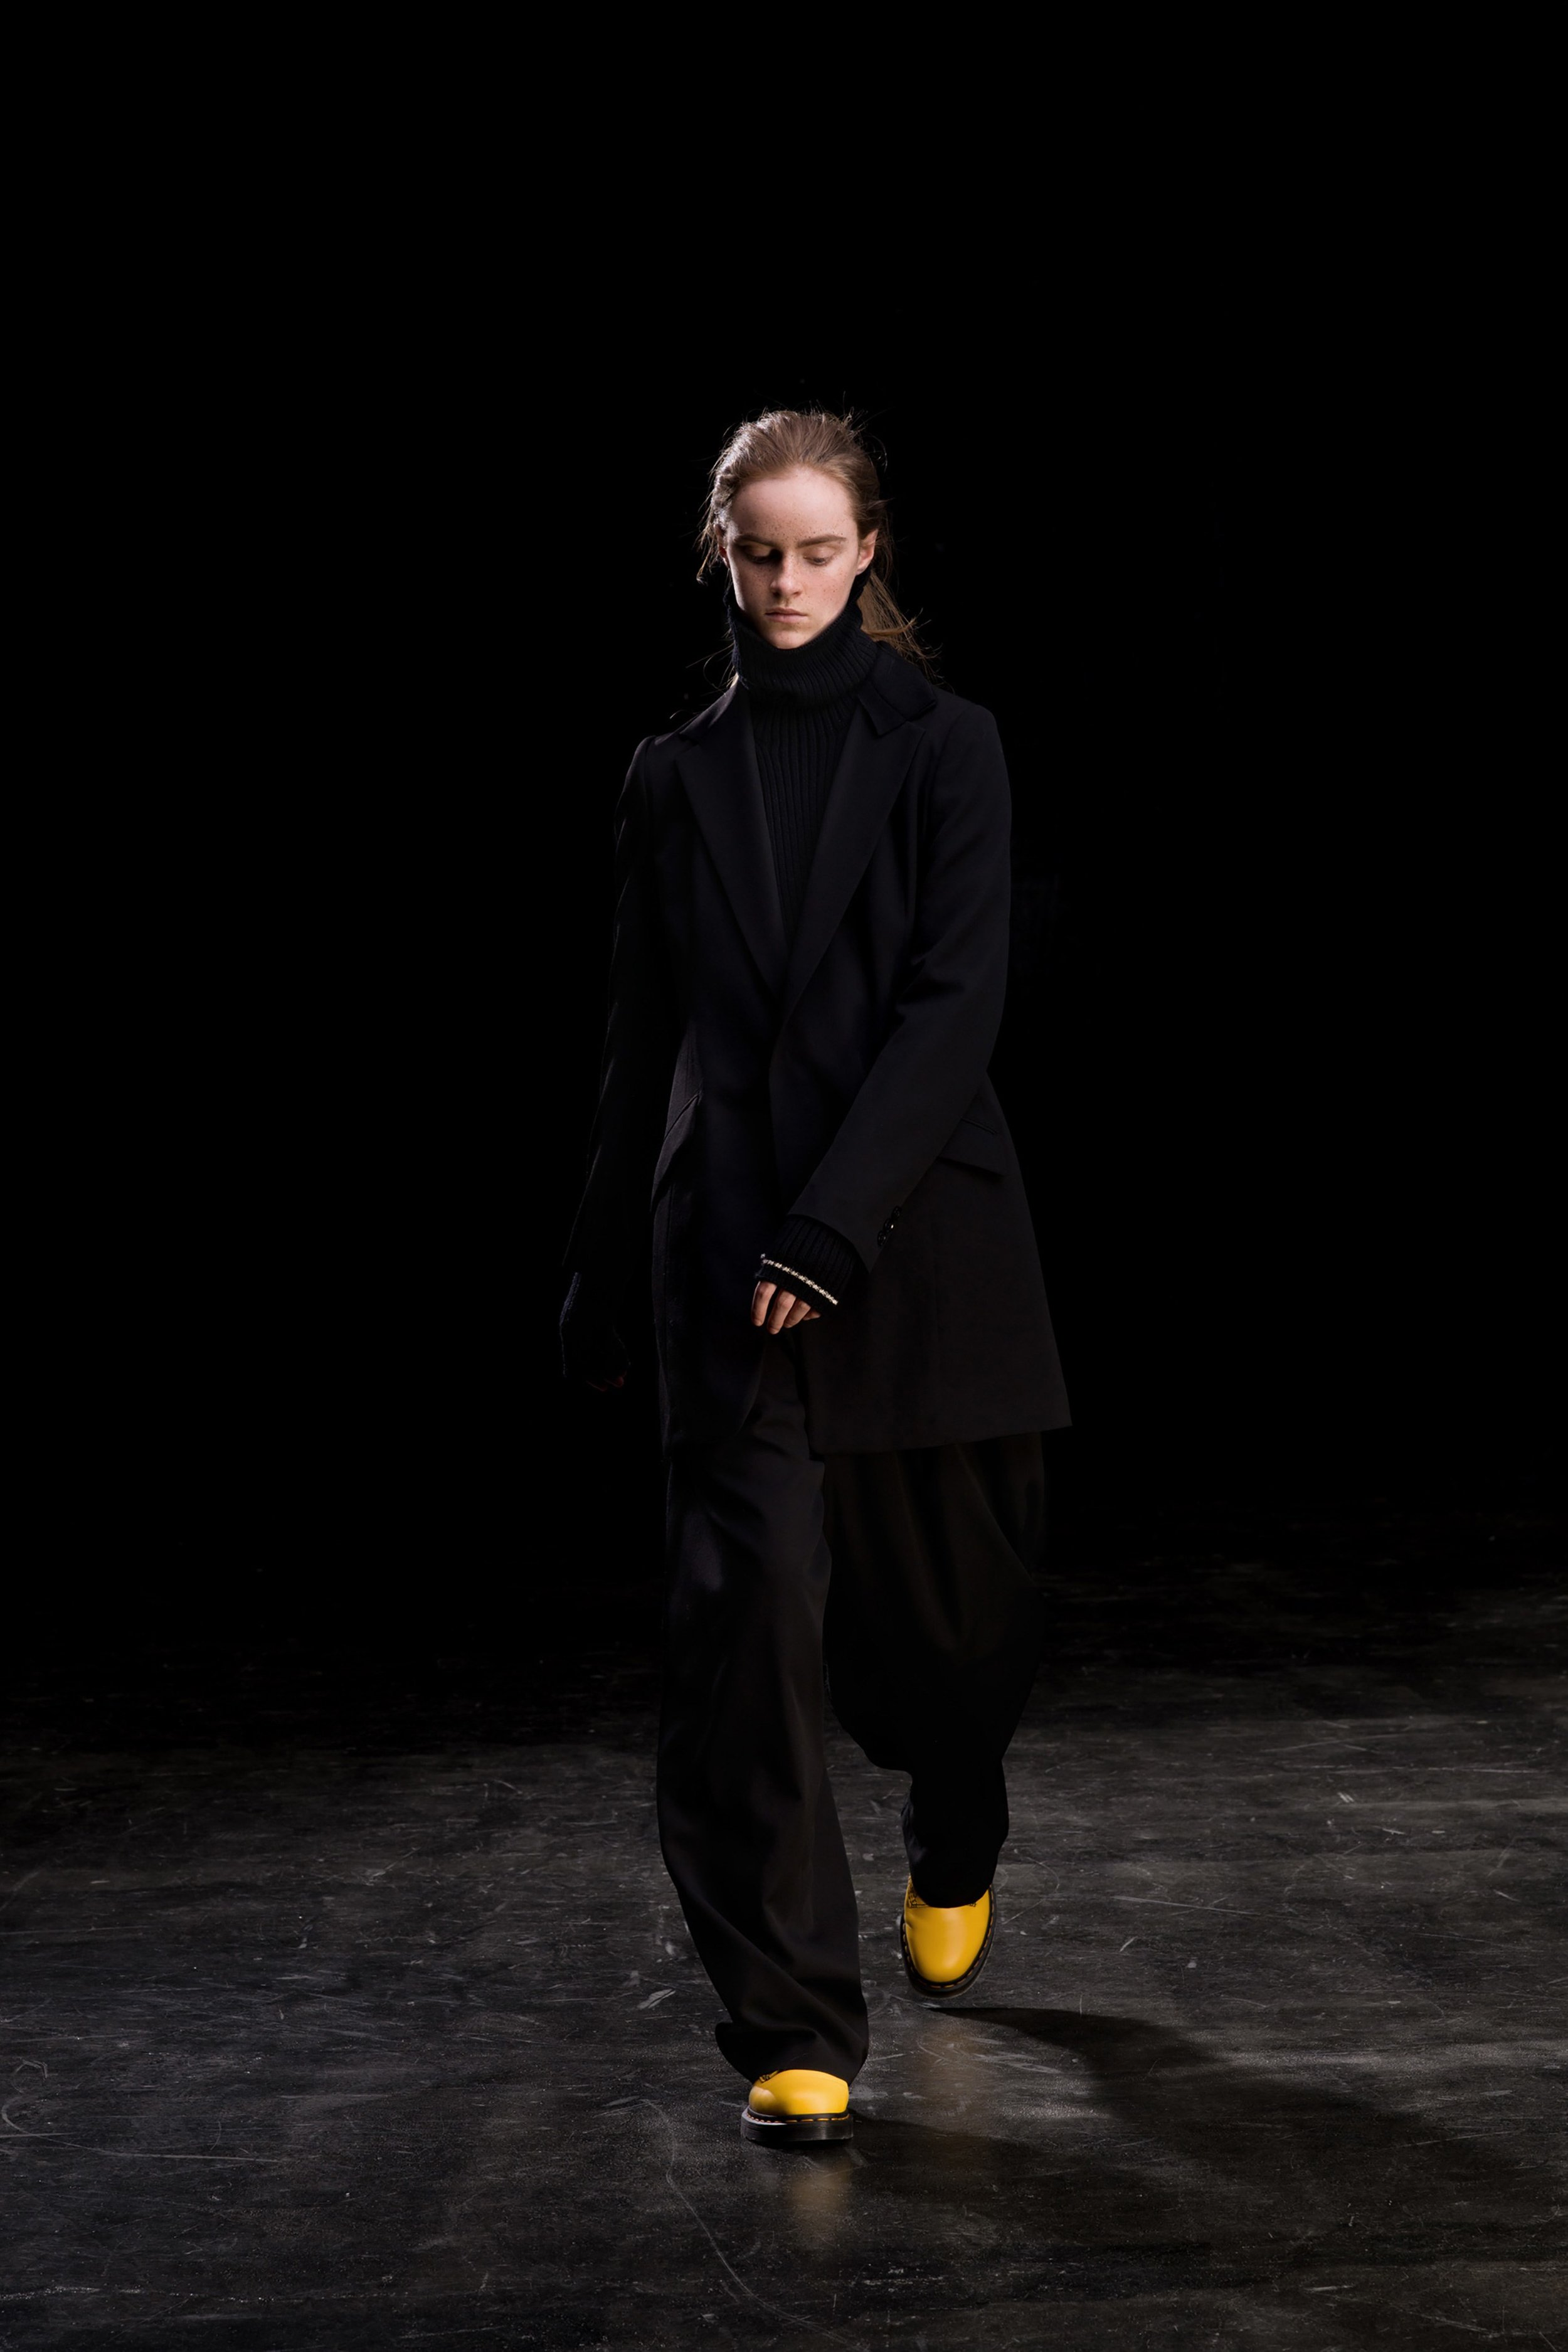 00002-Ys-Yohji-Yamamoto-FALL-19-Ready-To-Wear.jpg